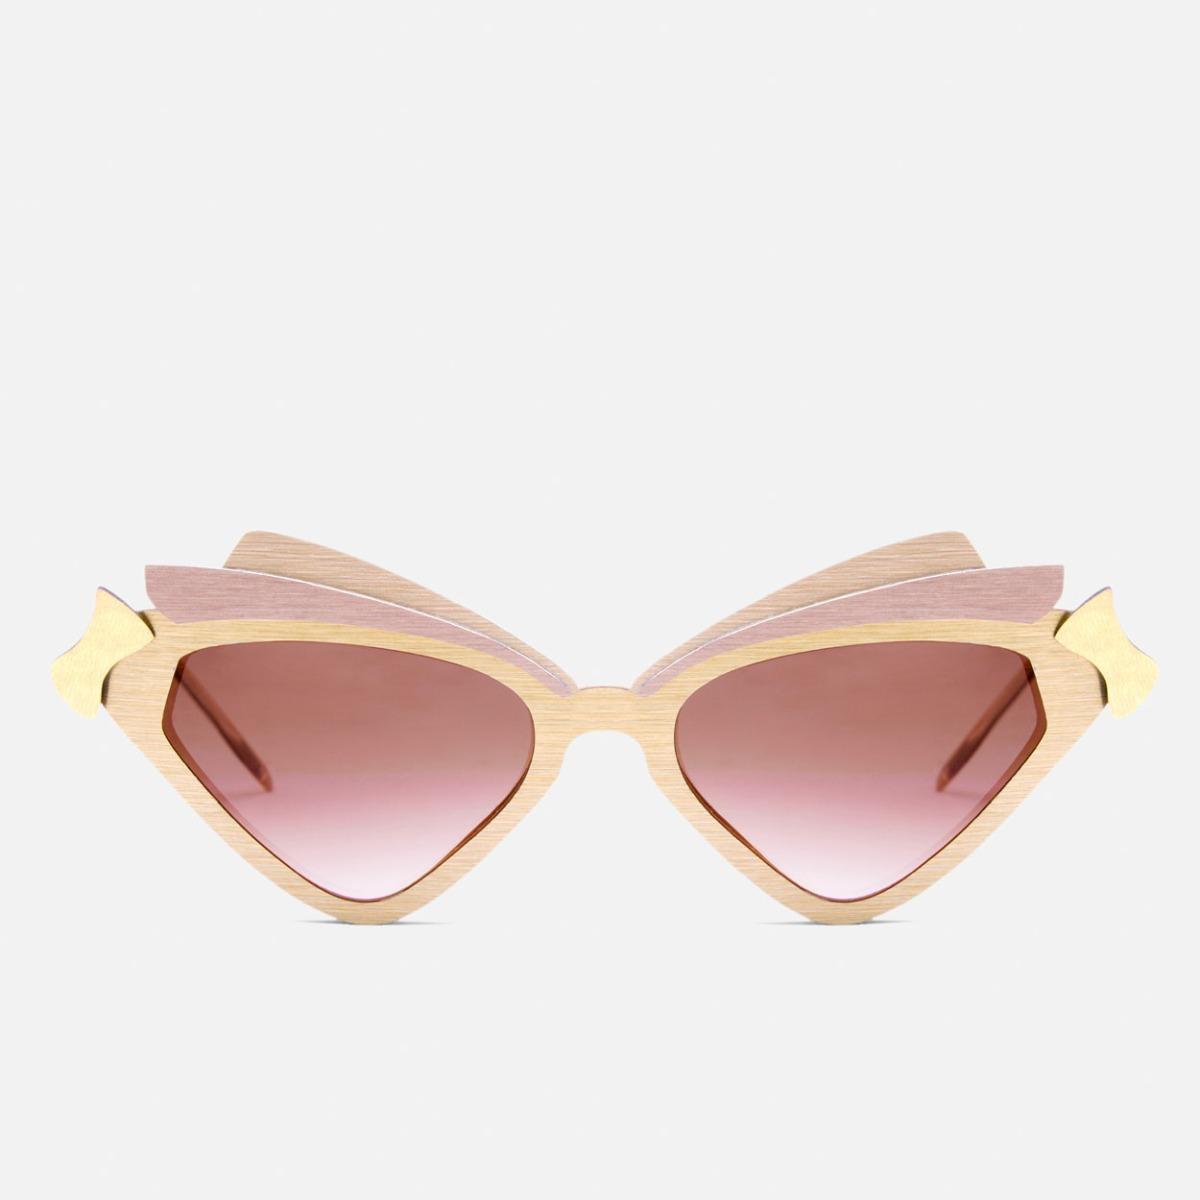 Deseraiki Icon sunglasses